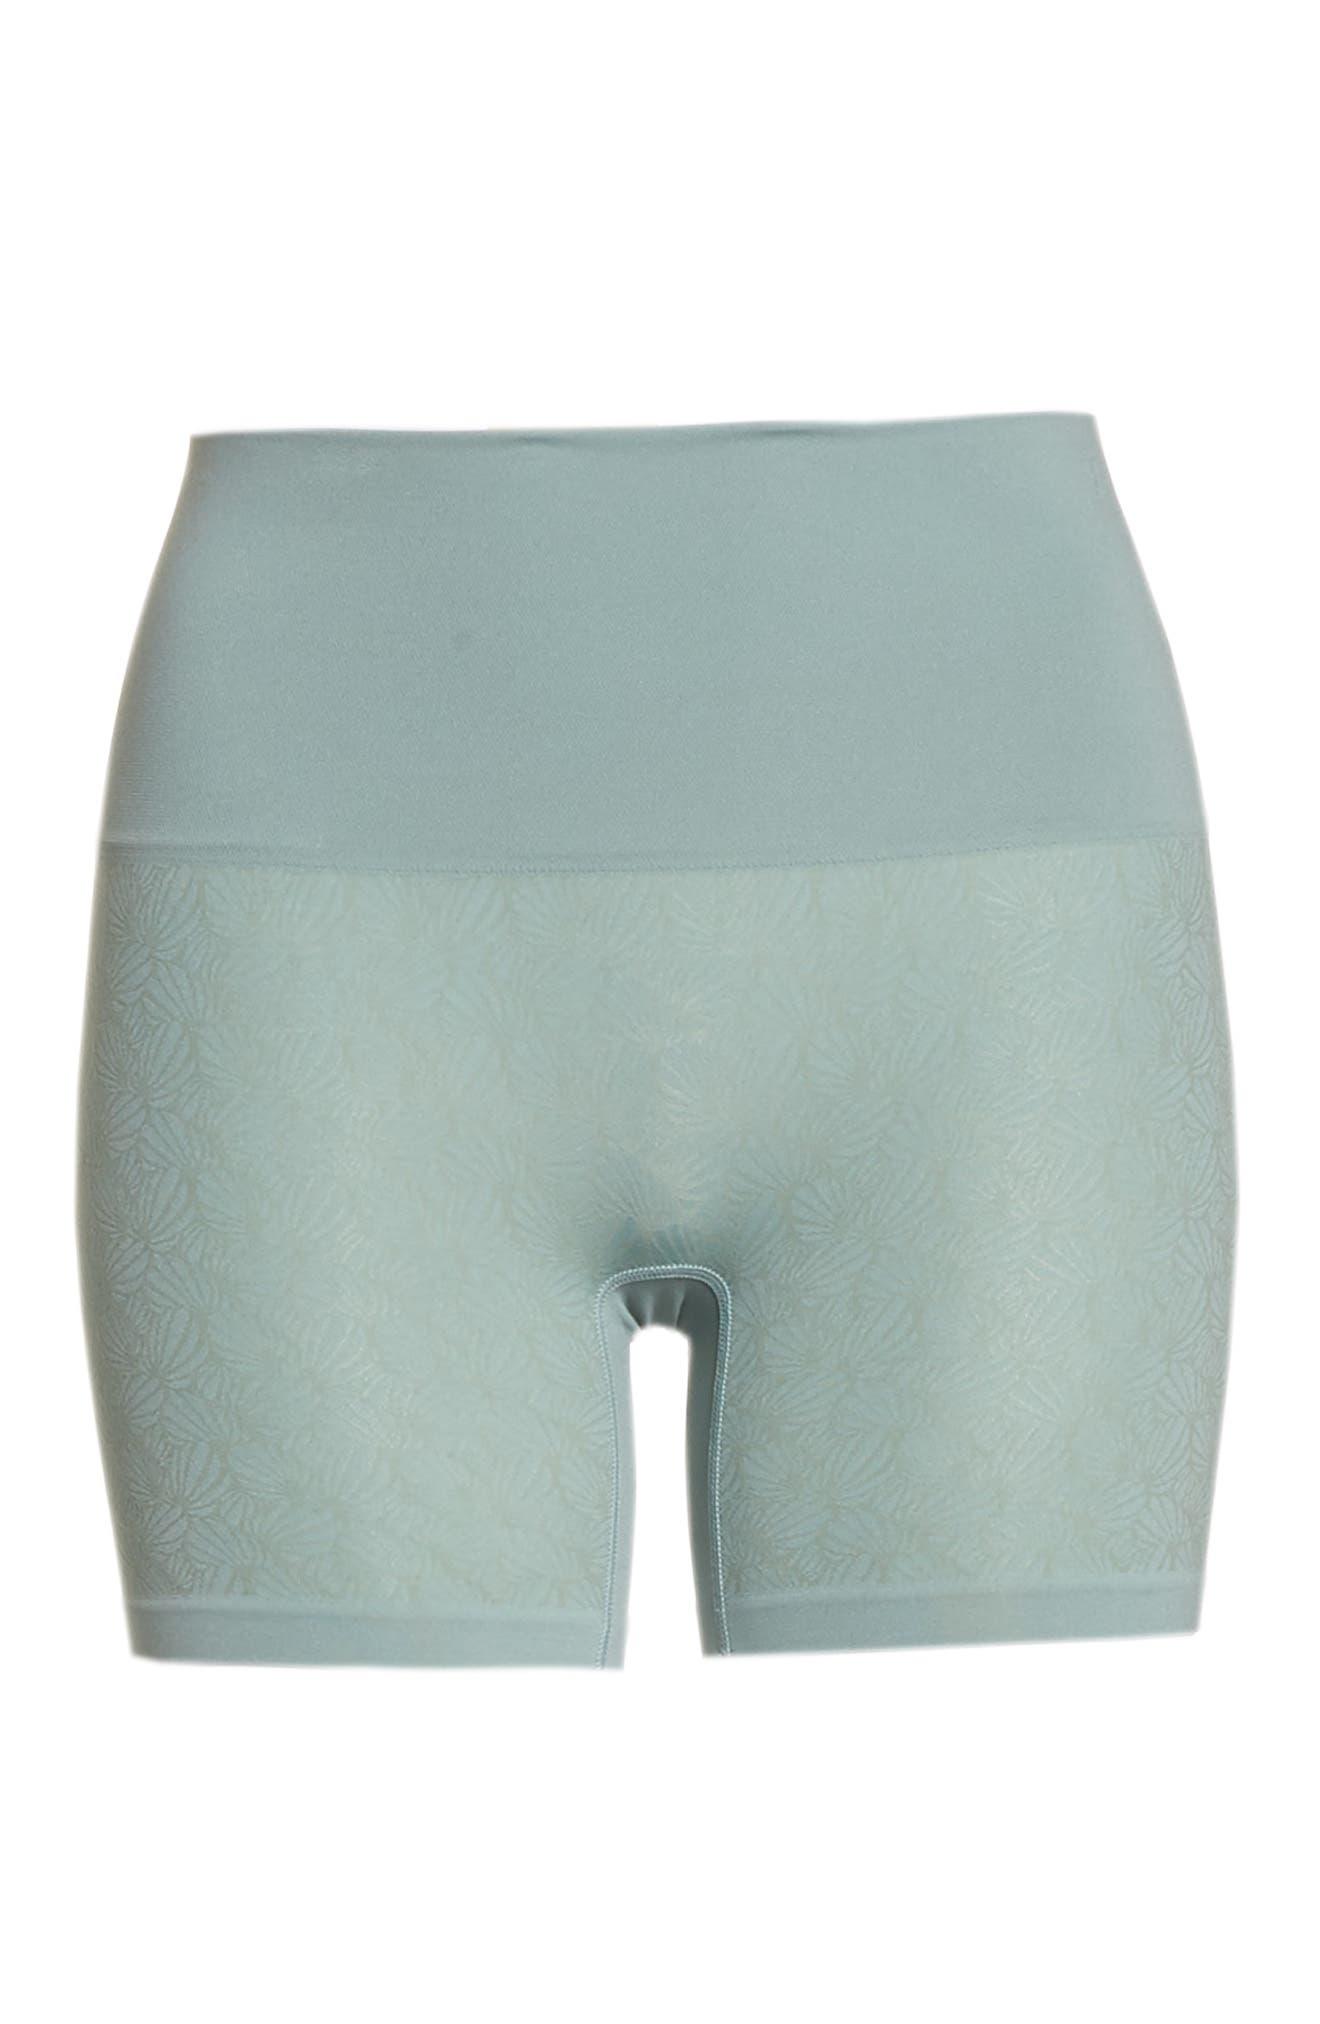 Ultralight Seamless Shaping Shorts,                             Alternate thumbnail 6, color,                             SILVER BLUE